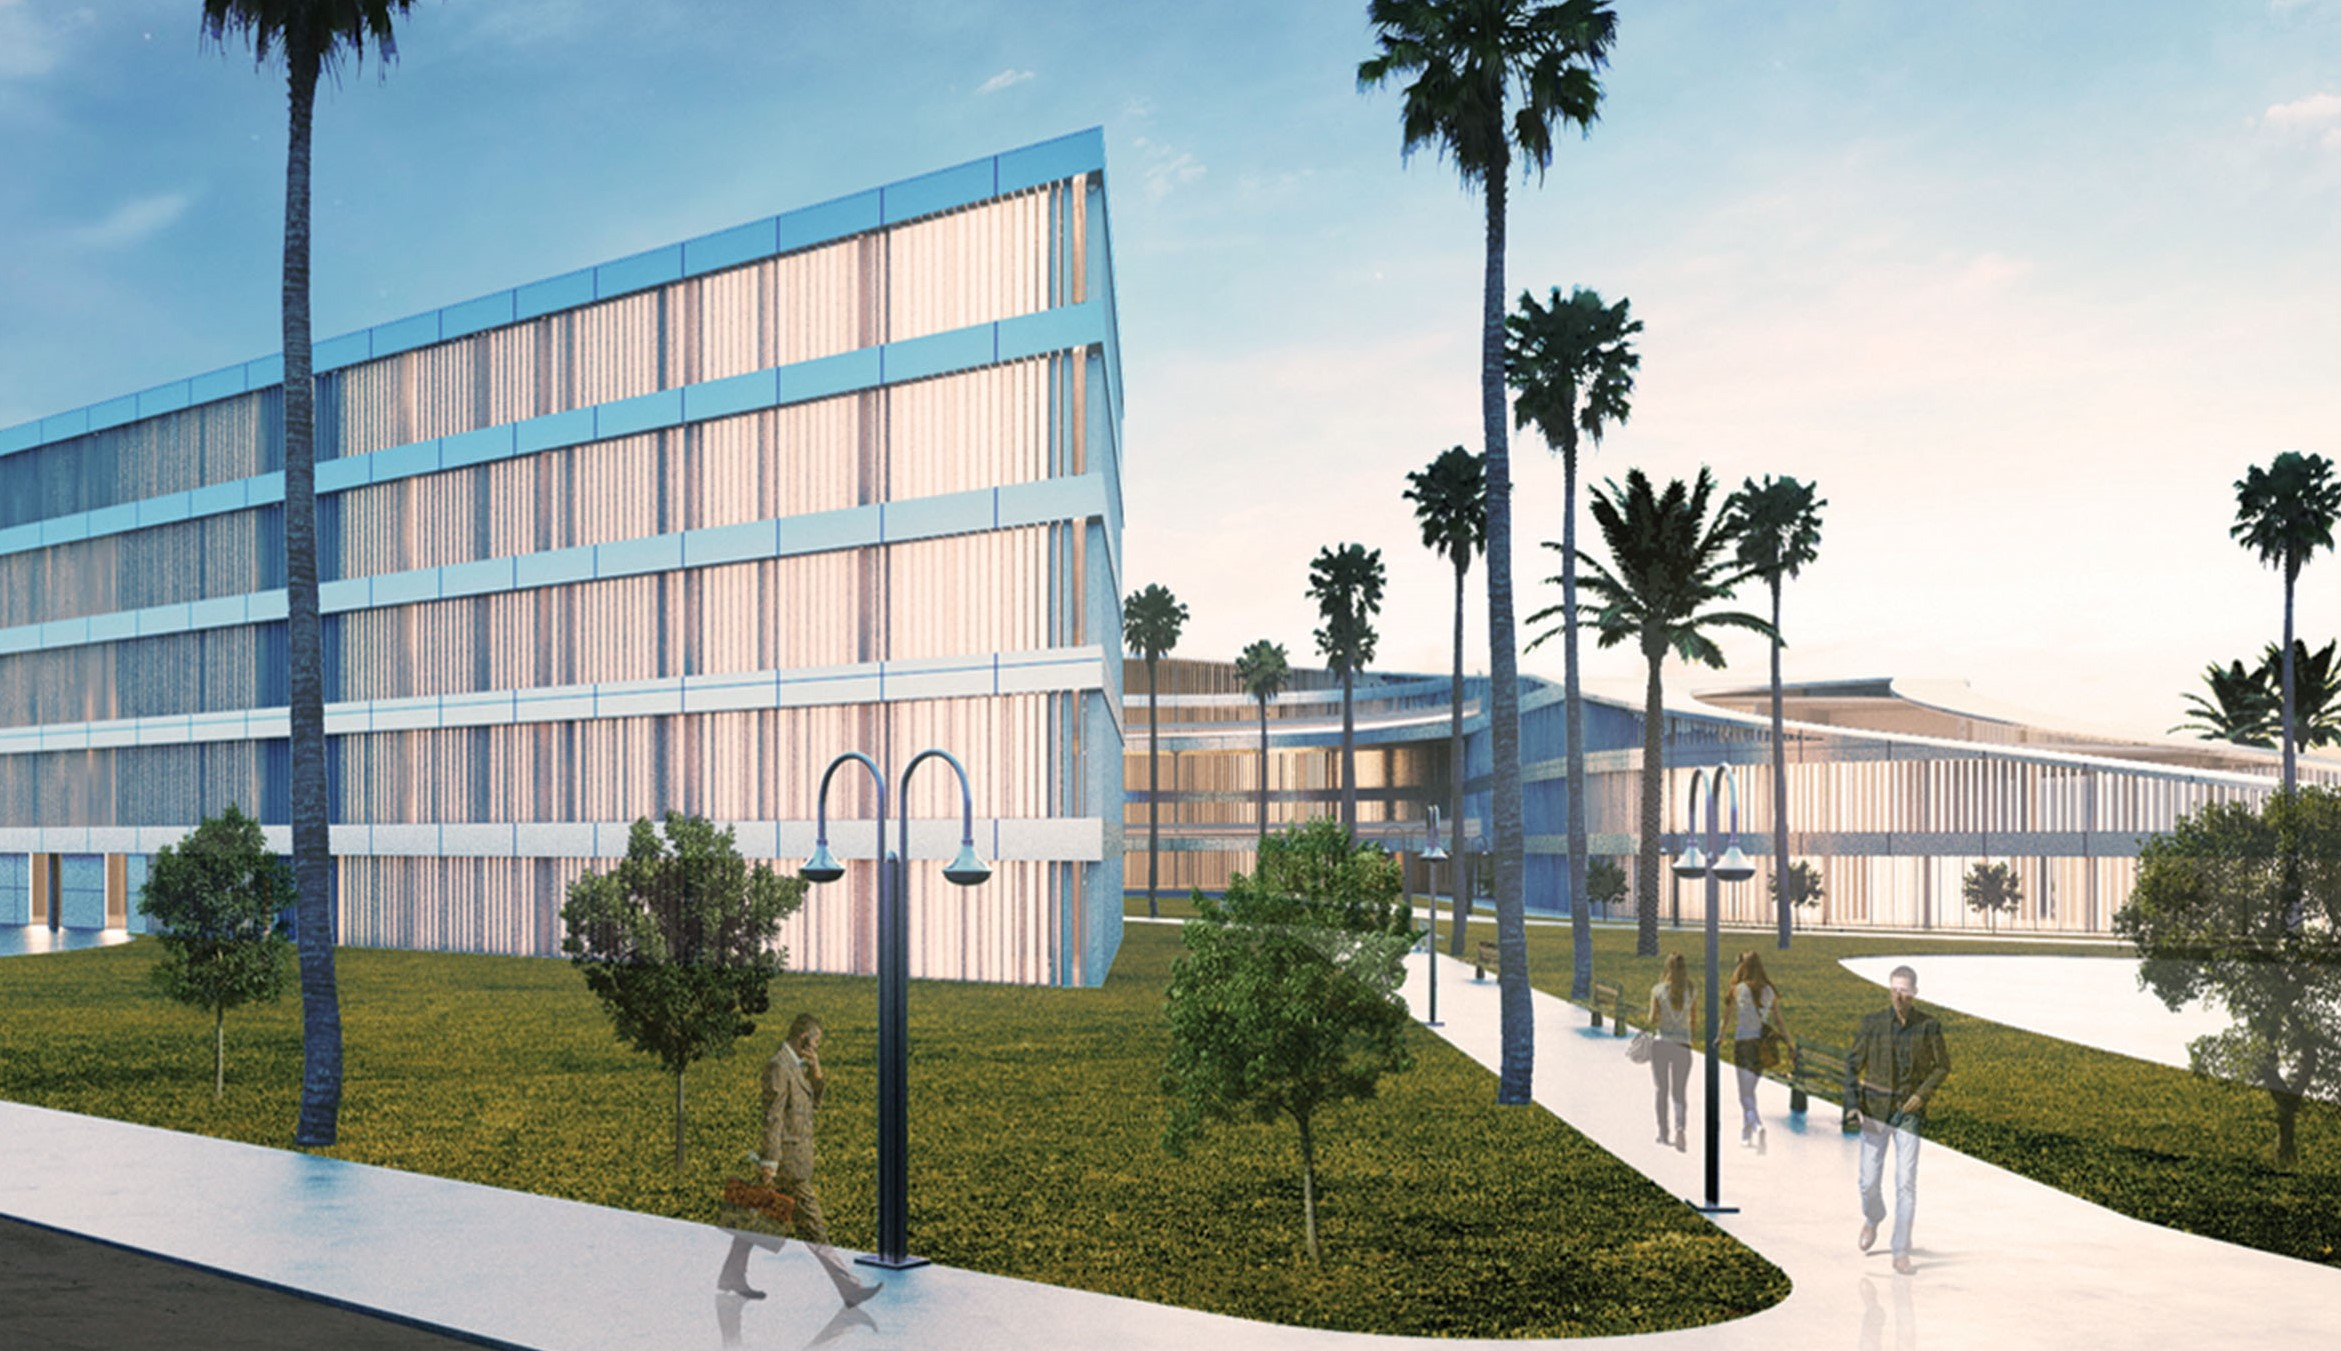 Casablanca – Campus d'entreprise